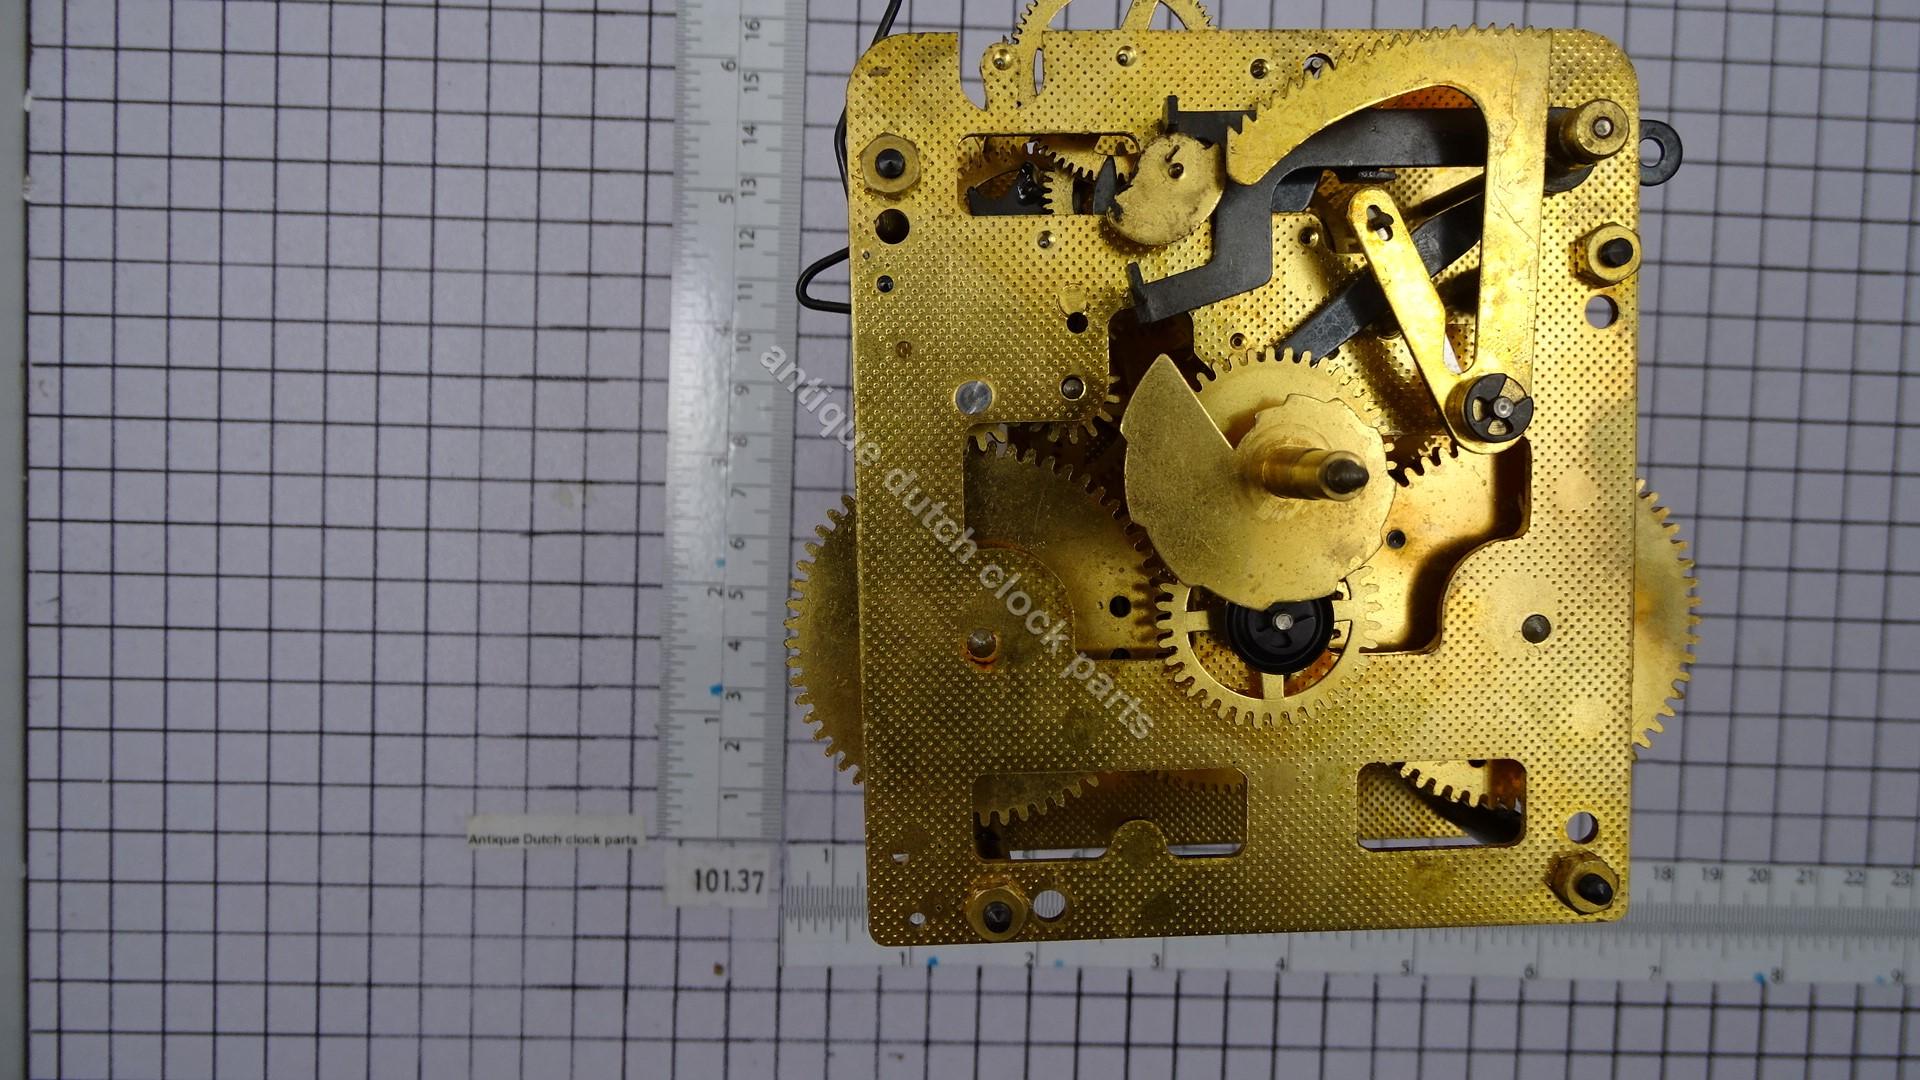 DUTCH CLOCK SUSPENSION SPRING HERMLE OR SBS CLOCK WORK.